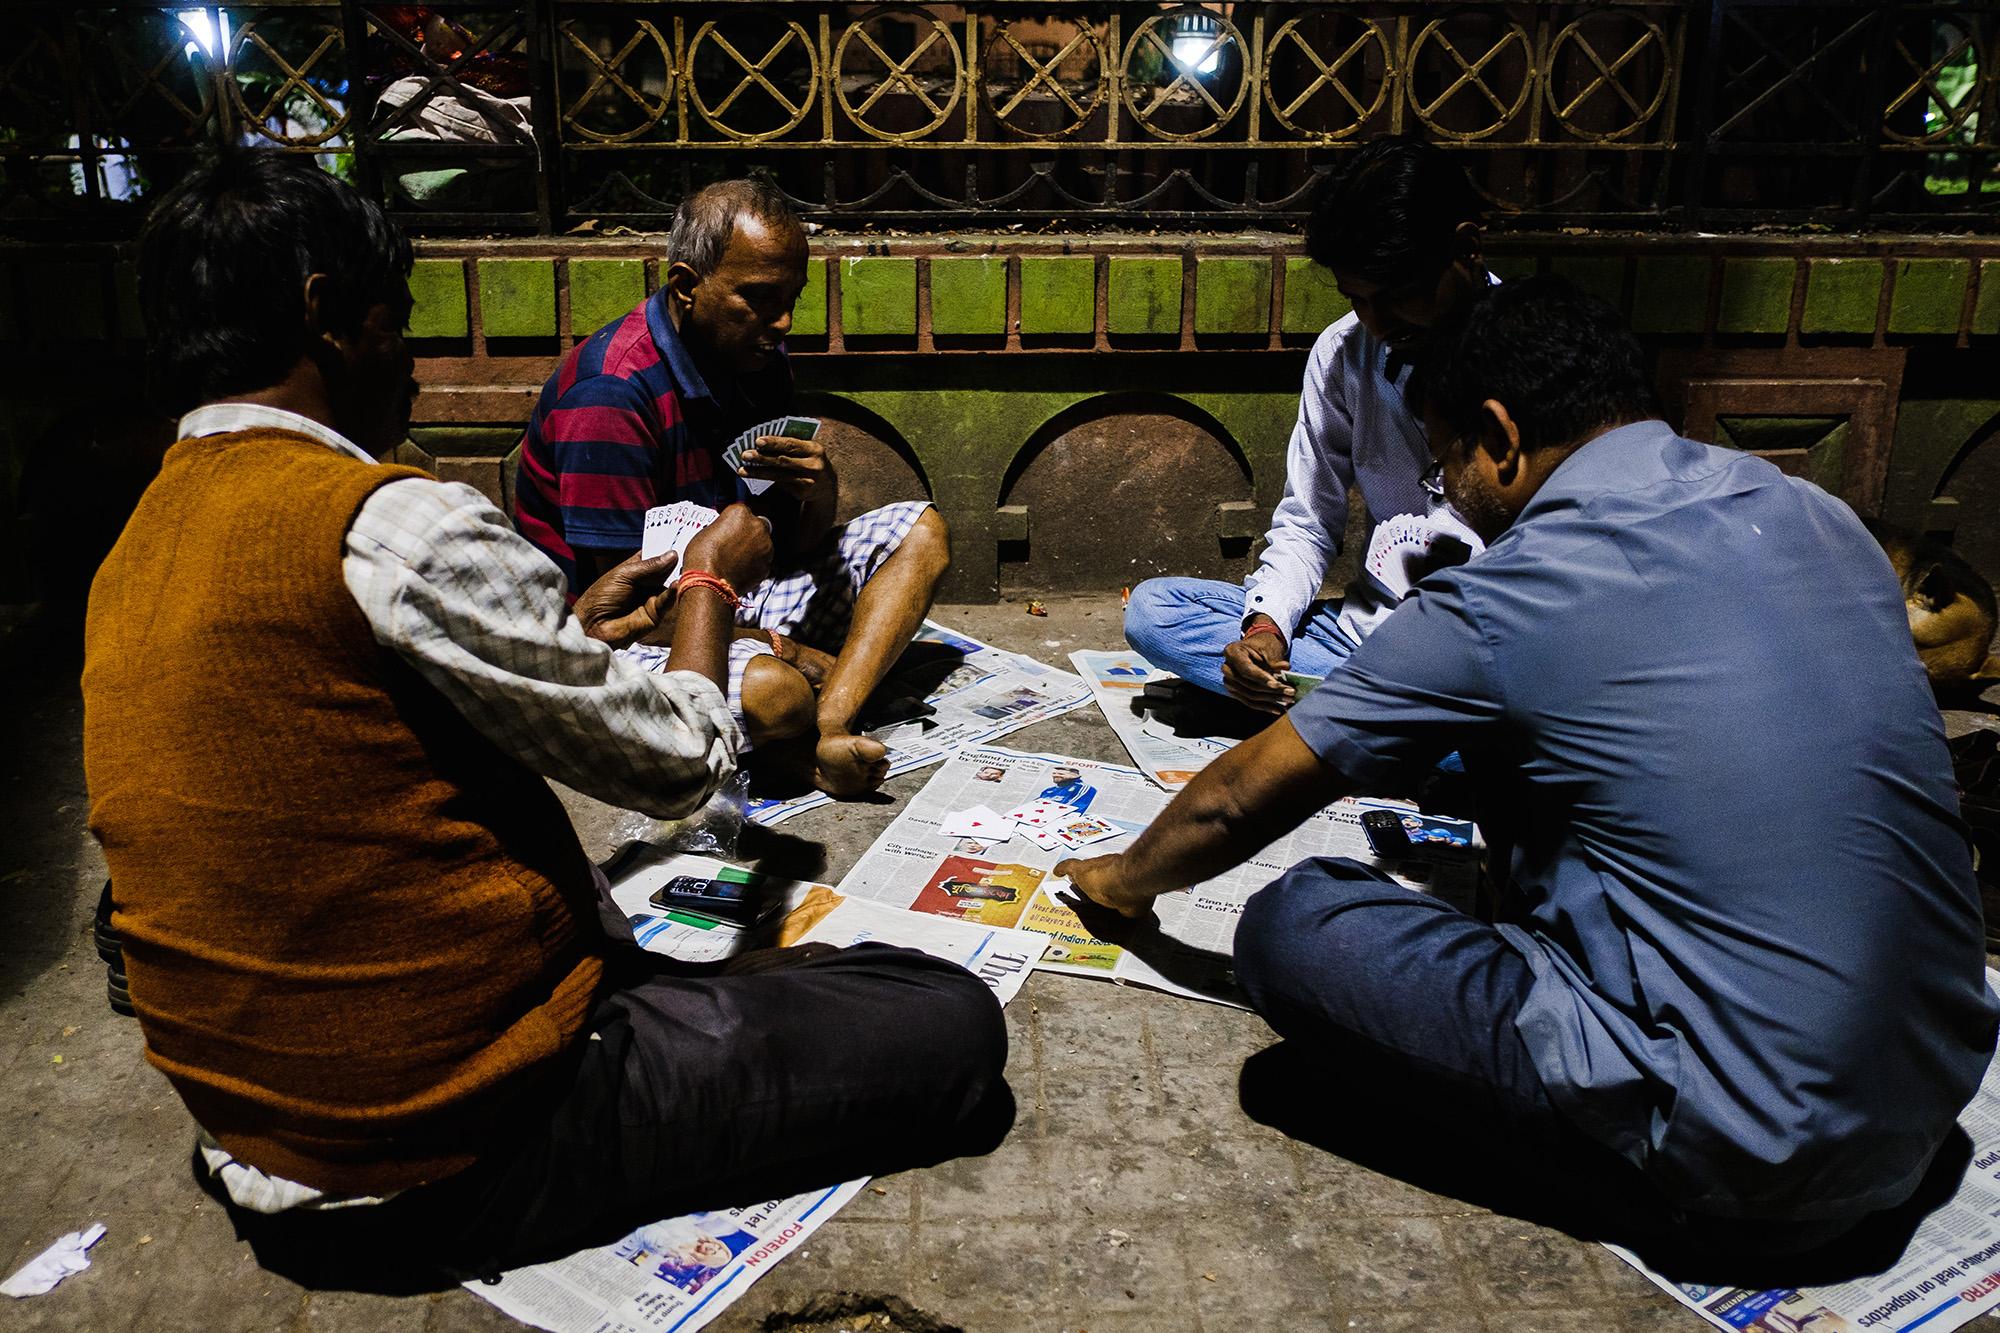 AnjaPoehlmann_India-Kolkata_108.jpg